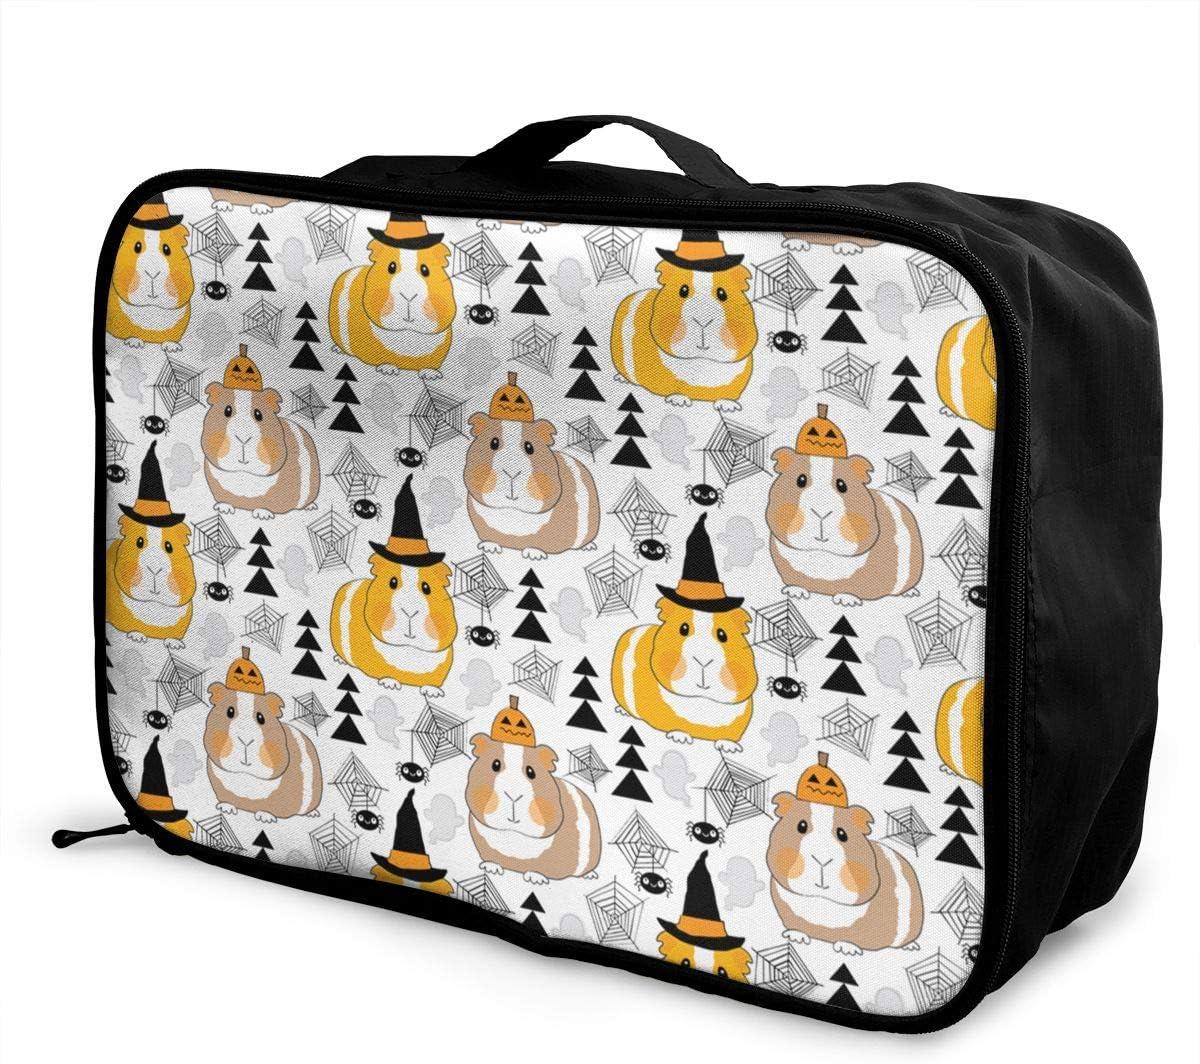 Rainbow Gamer Travel Carry-on Luggage Weekender Bag Overnight Tote Flight Duffel In Trolley Handle